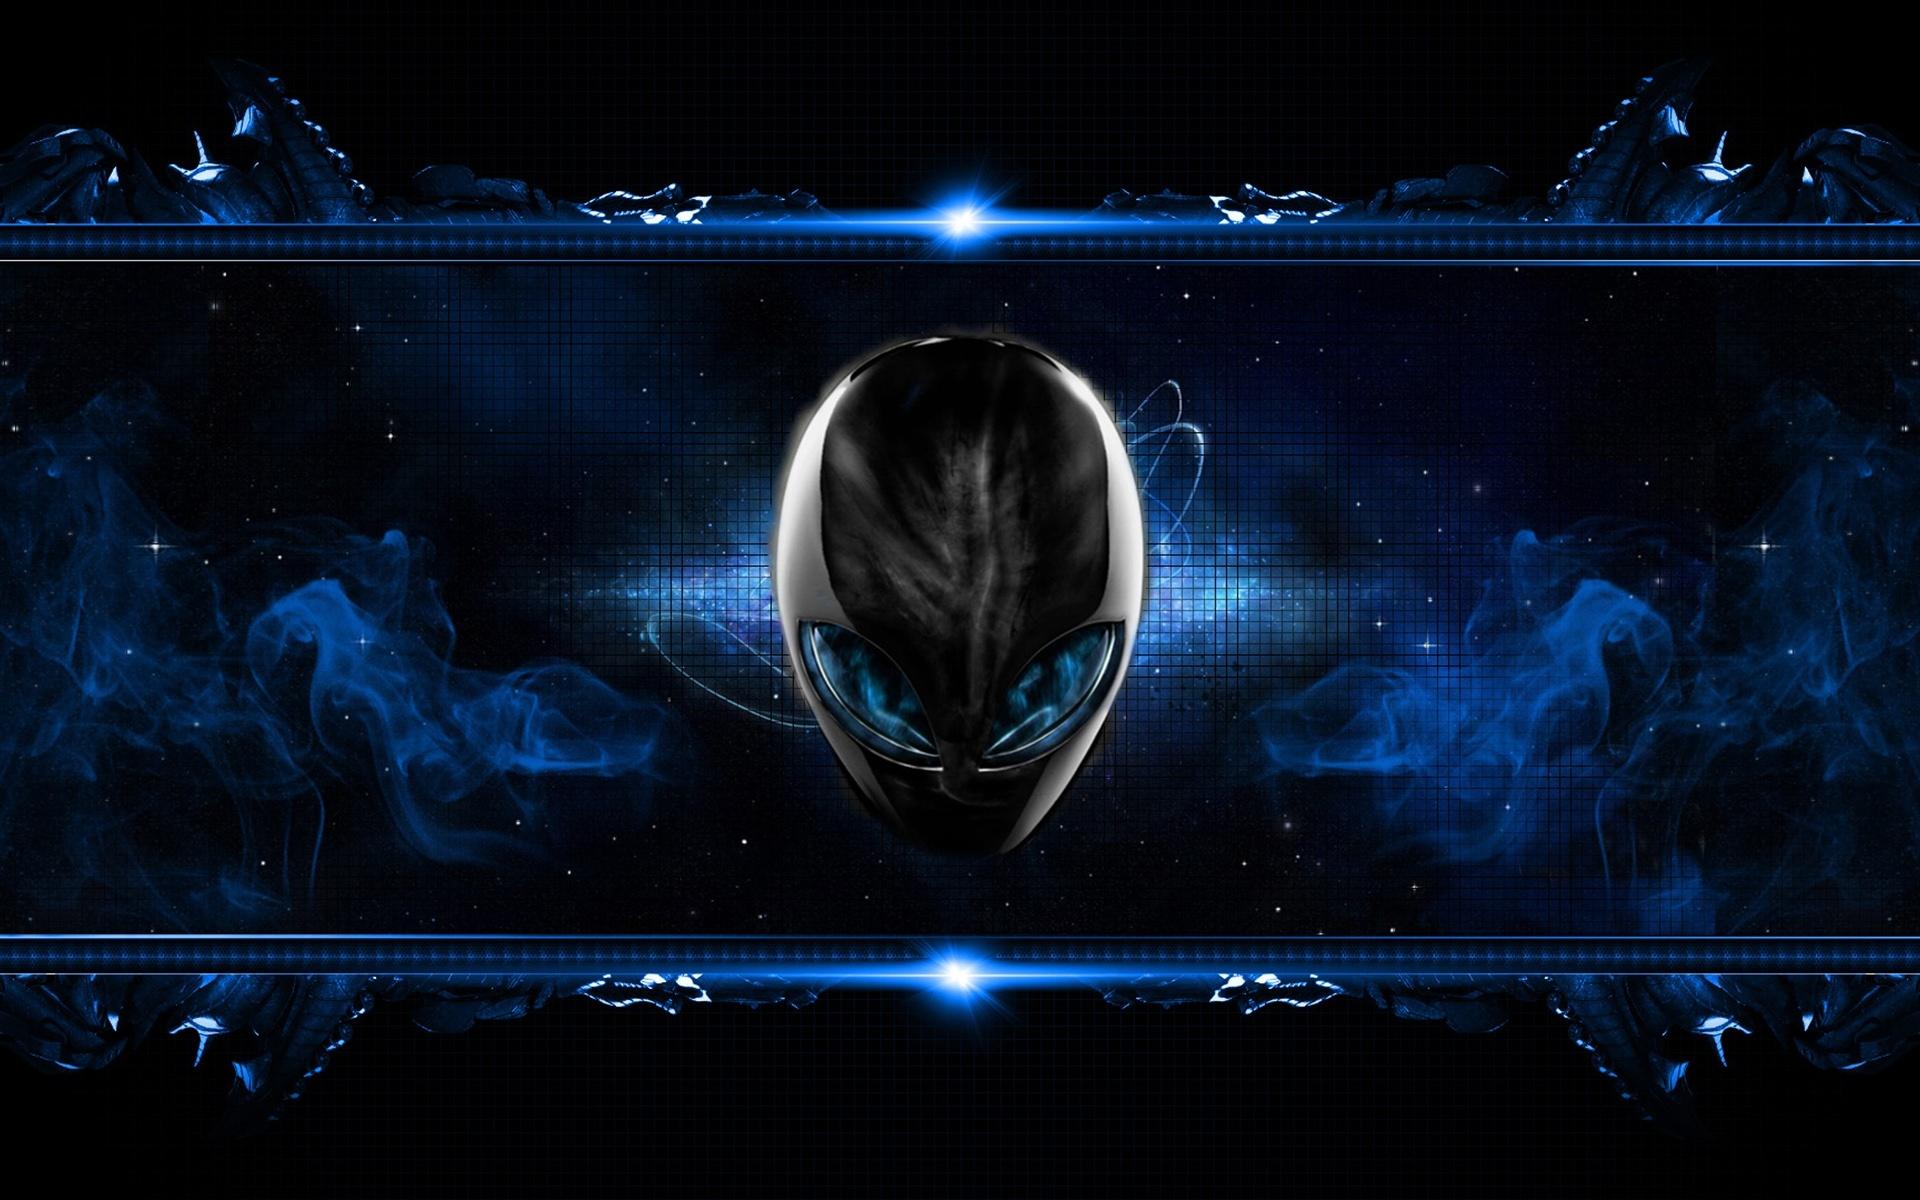 10 Most Popular Black And Blue Gaming Wallpaper Full Hd: Alienware HD Wallpaper